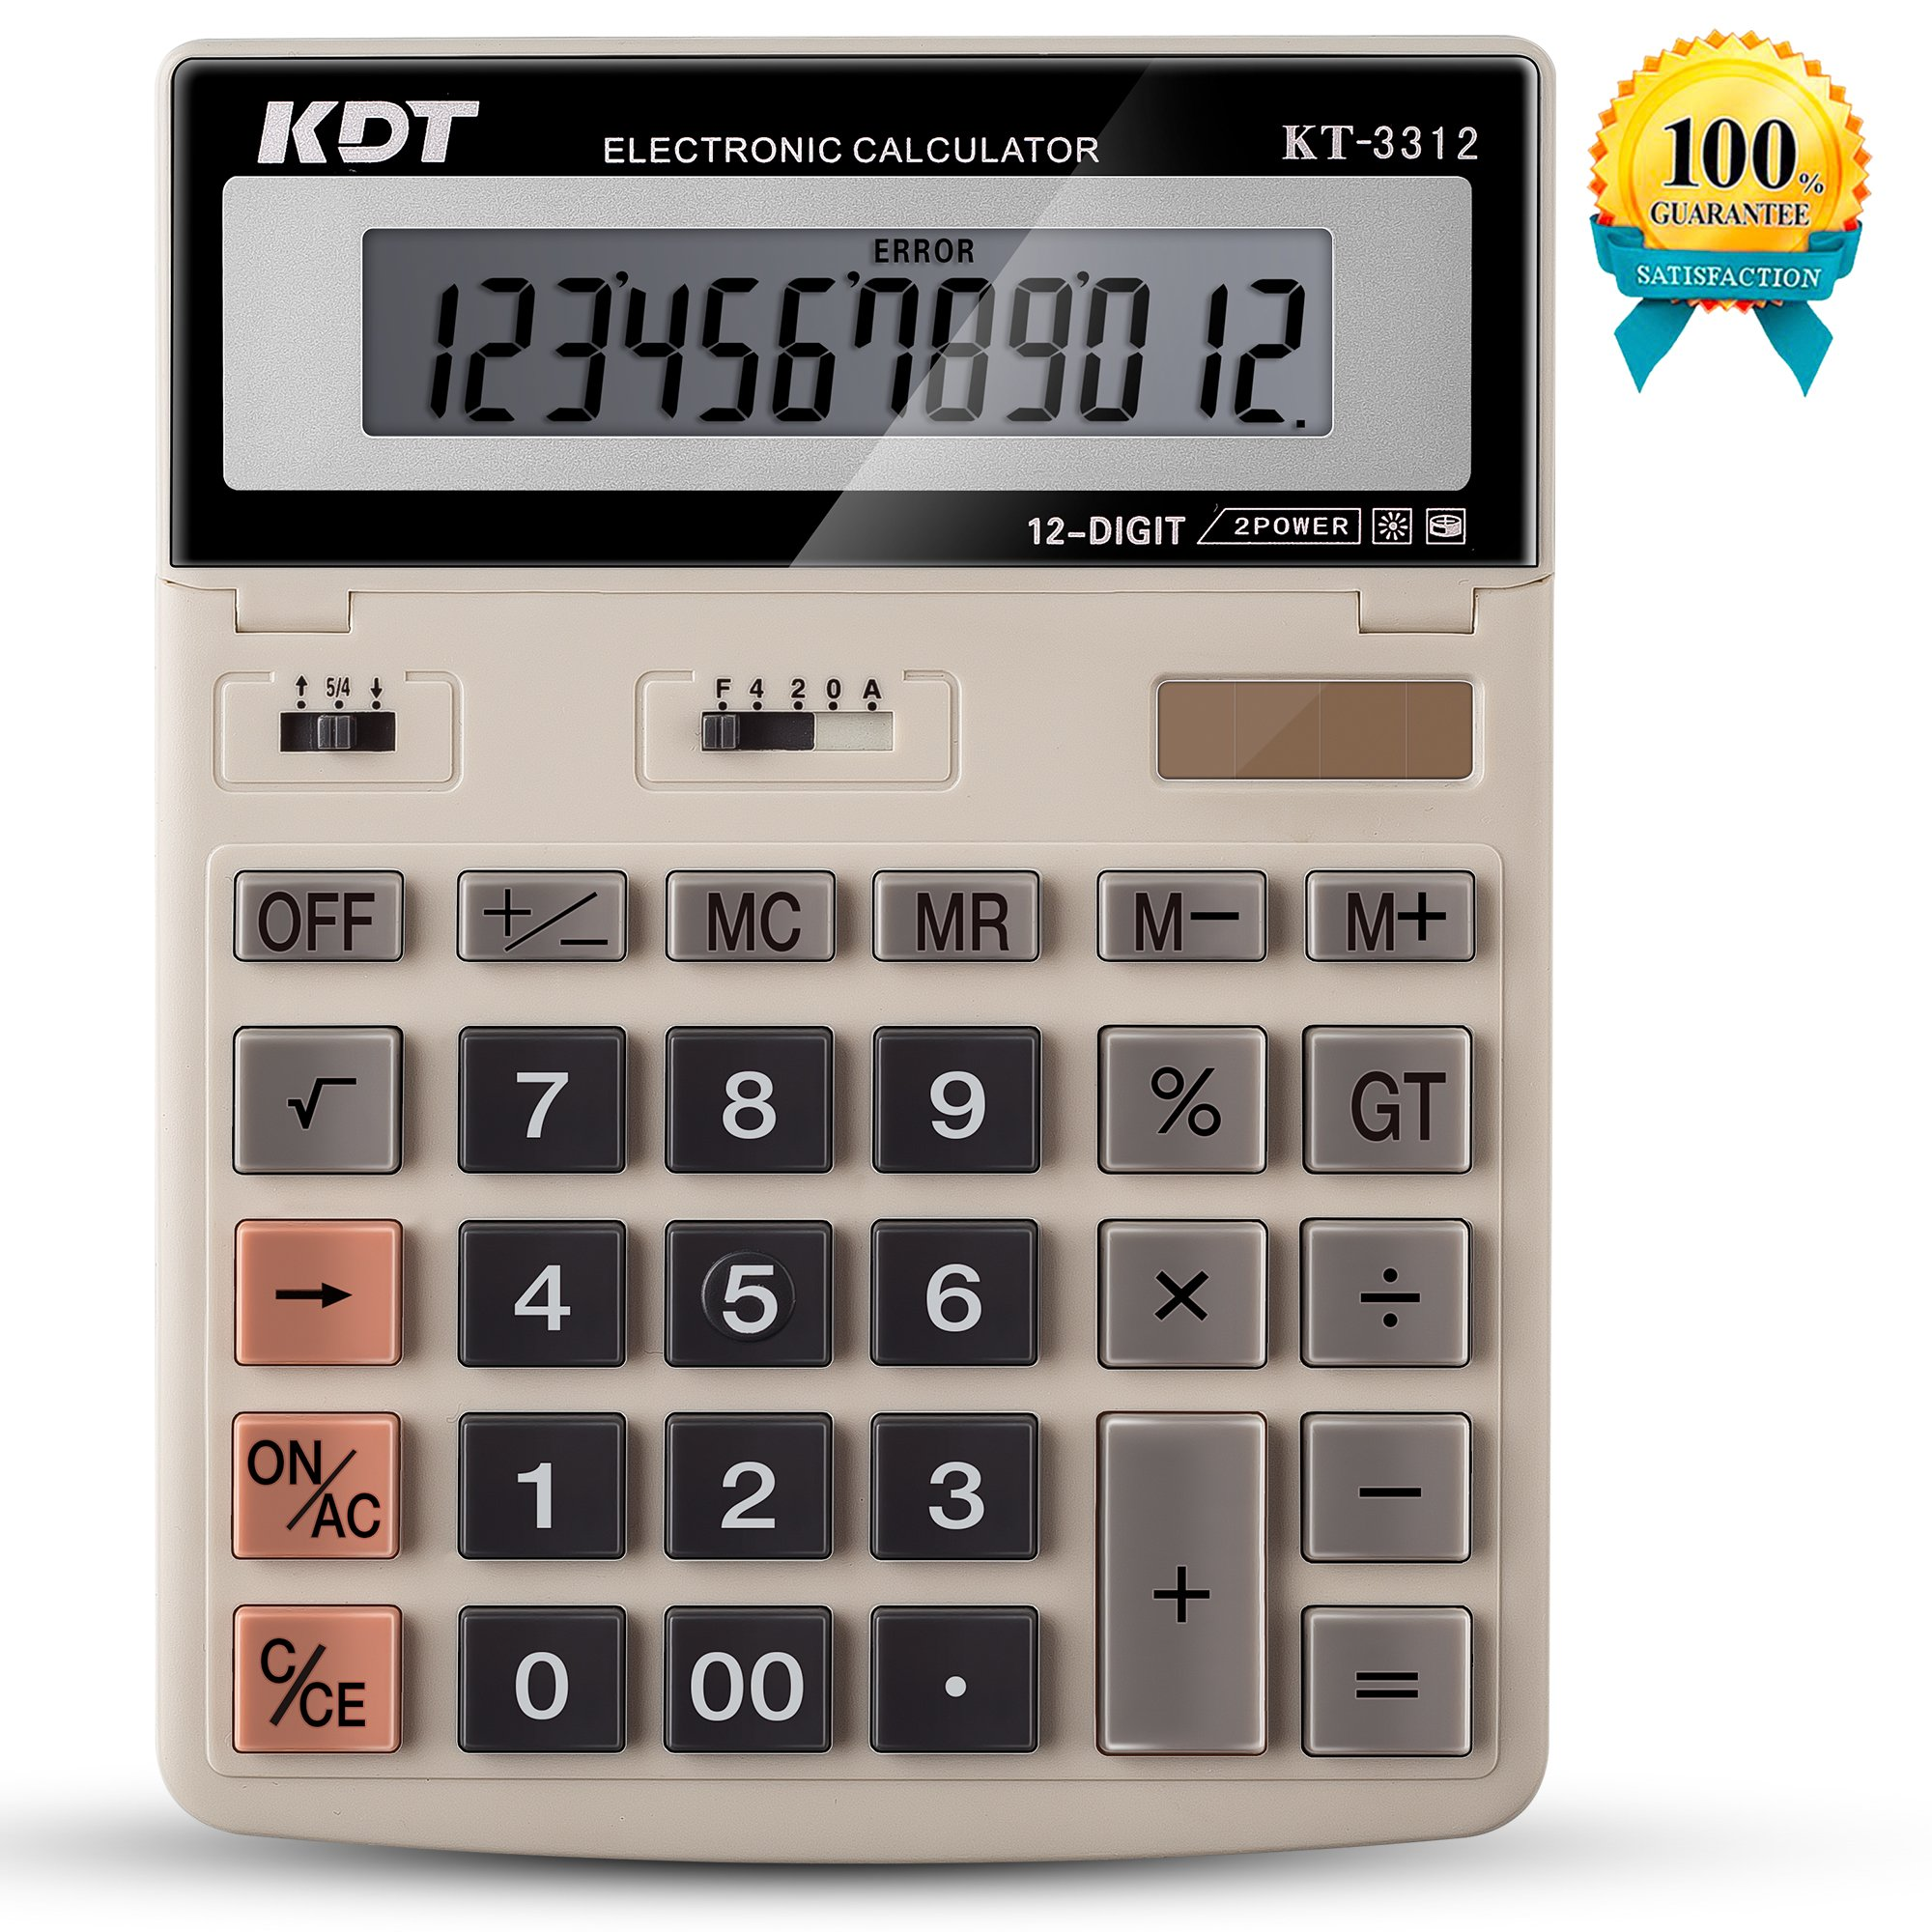 Calculator, KDT Handheld Standard Function Desktop Calculators, Solar Battery LCD Display Office Calculator, Flip Screen With 12 Digit Large Display (Ivory) by KDT